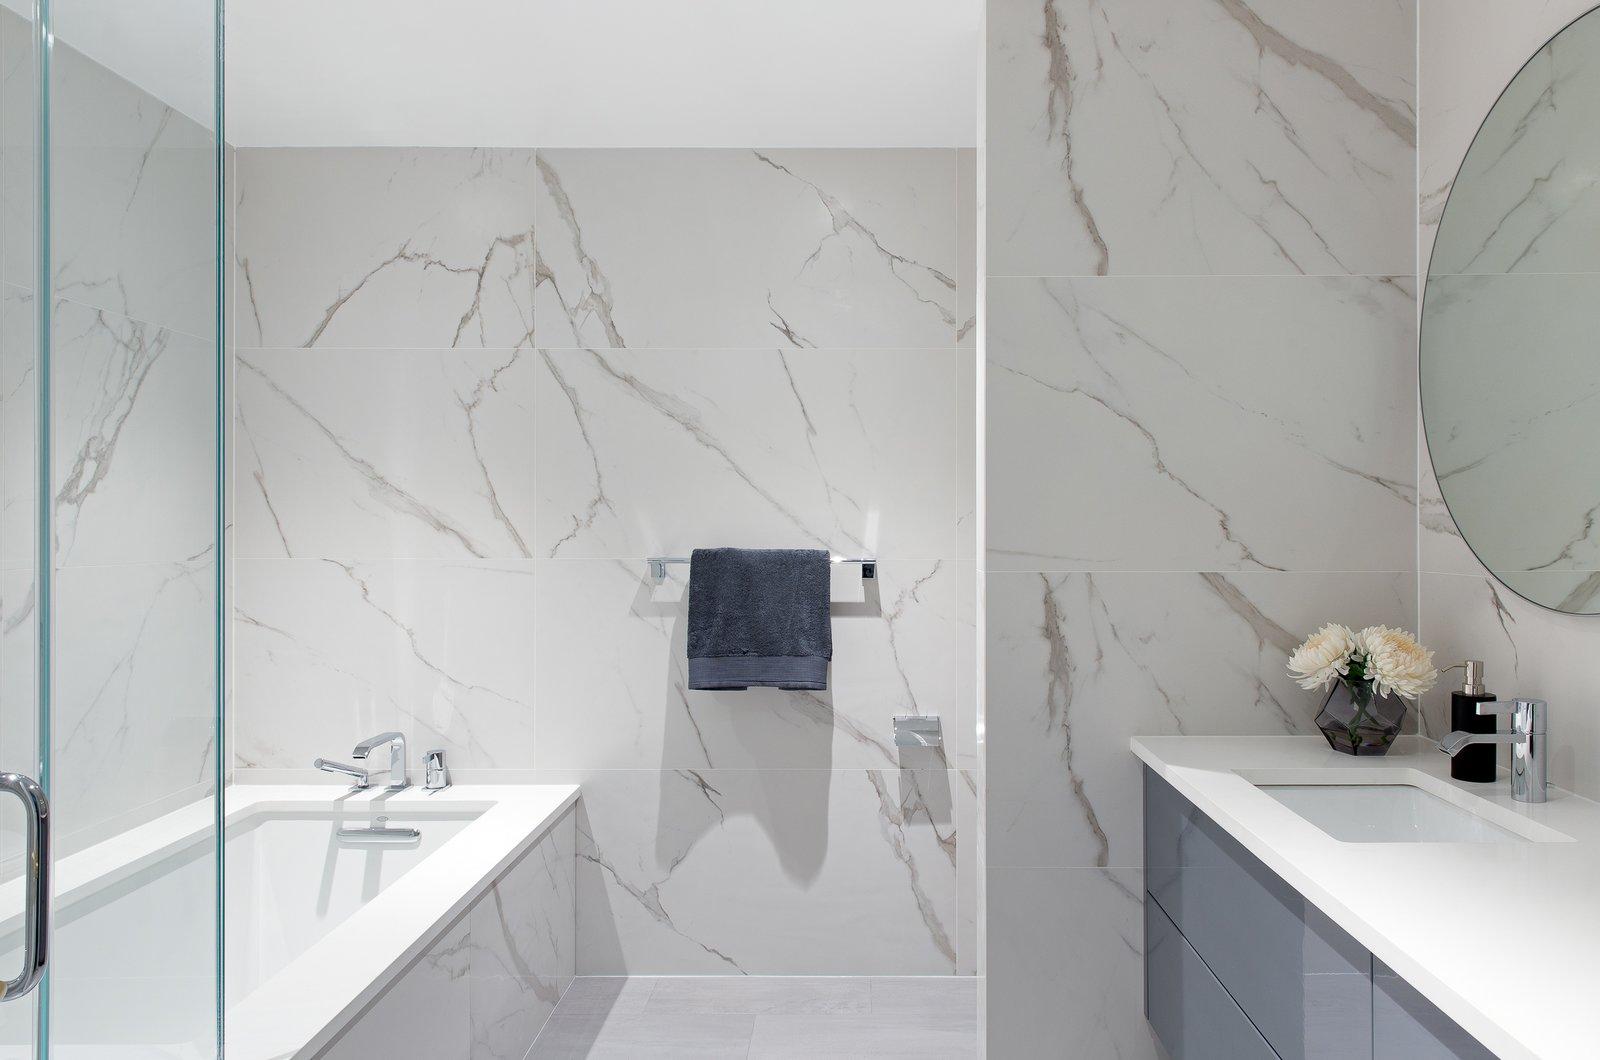 Bath Room, Enclosed Shower, Stone Counter, Engineered Quartz Counter, Porcelain Tile Floor, Undermount Tub, Soaking Tub, Marble Wall, Undermount Sink, and Porcelain Tile Wall  Boerum Hill Brownstone